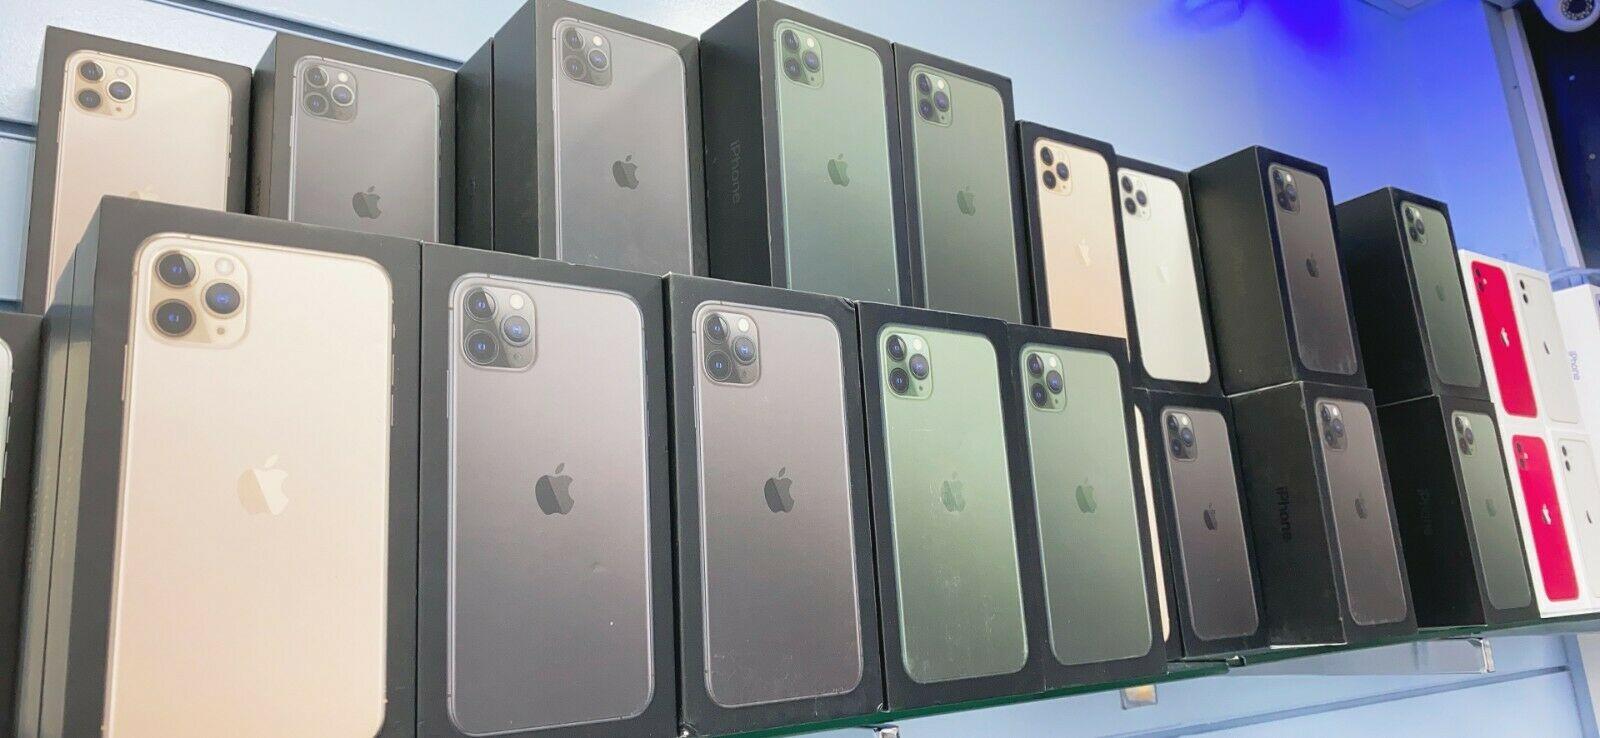 Apple iPhone 11 Pro 64GB iPhone 11 Pro Max 64GB